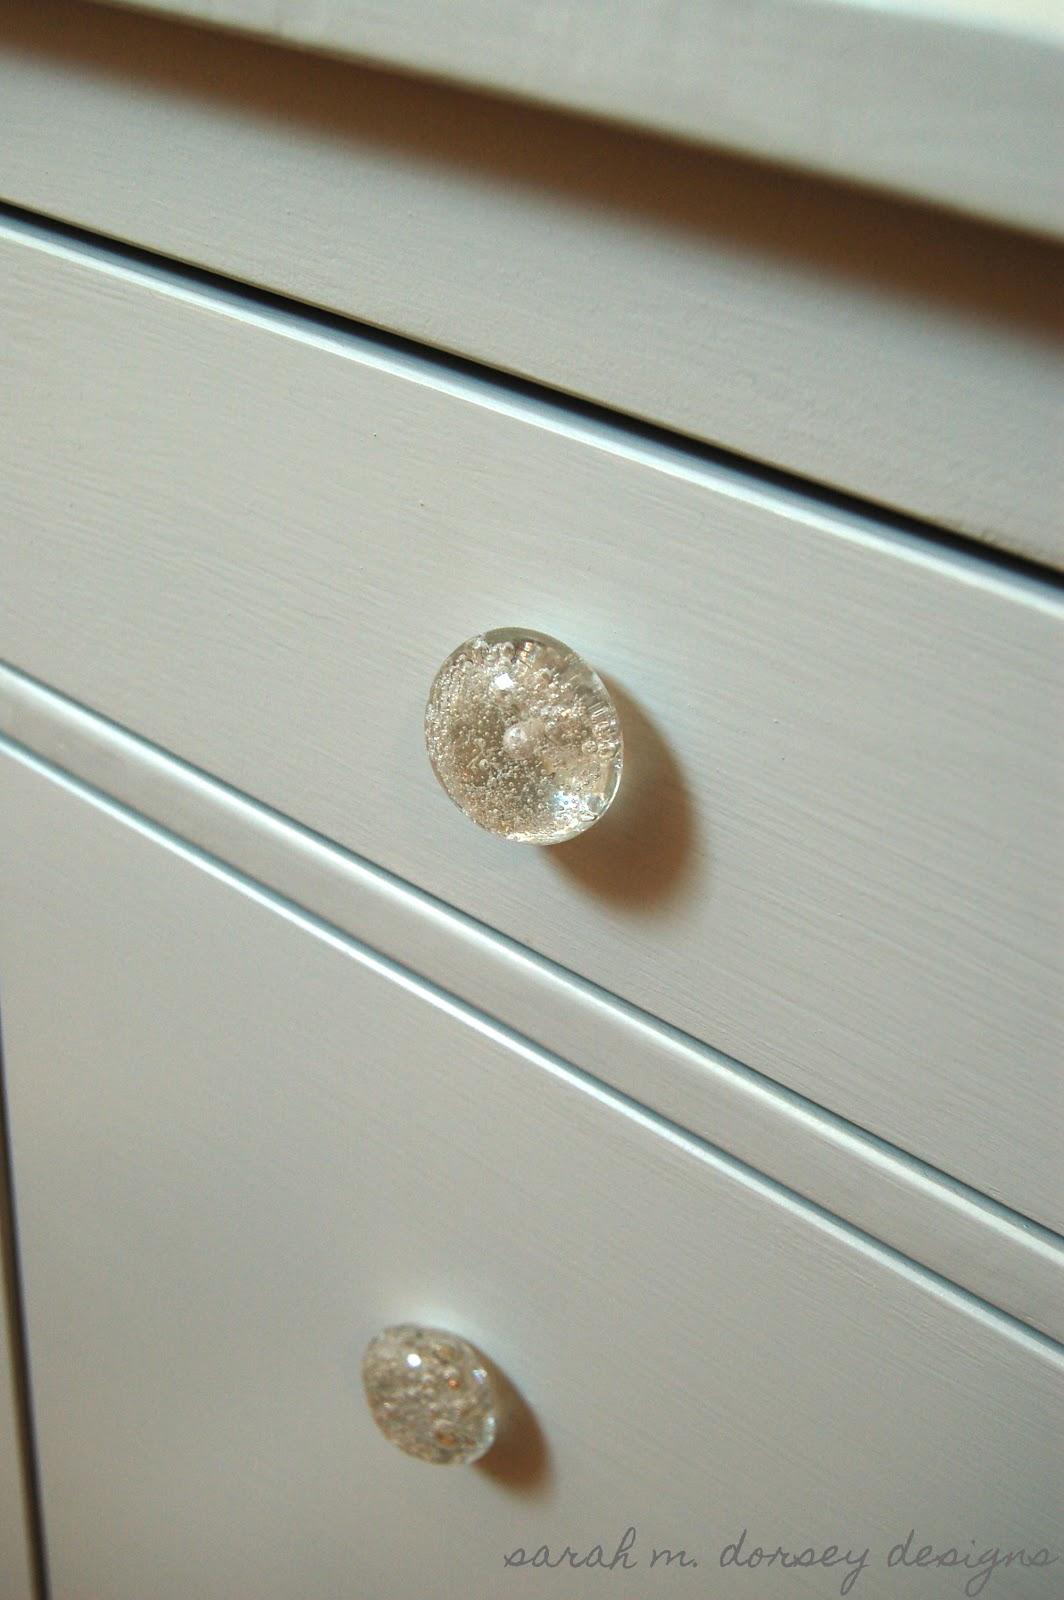 sarah m dorsey designs Ikea Hemnes Shoe Cabinet Renovation